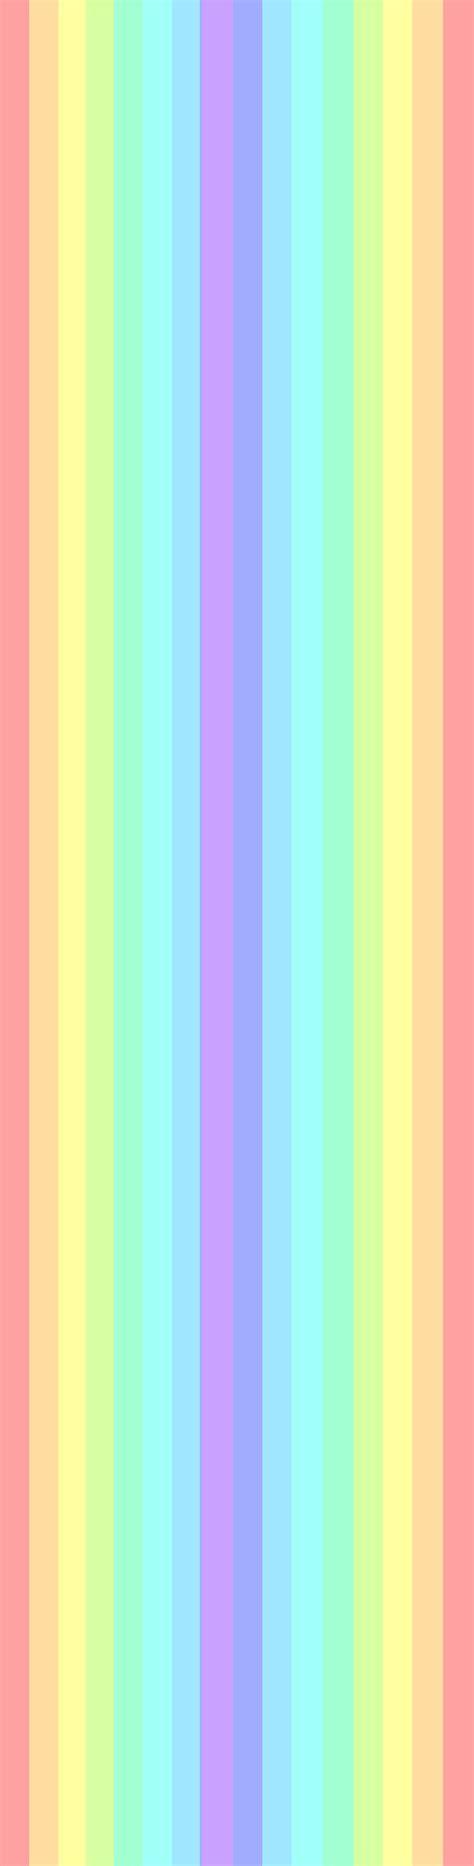 wallpaper tumblr rainbow cute rainbow background tumblr www imgkid com the